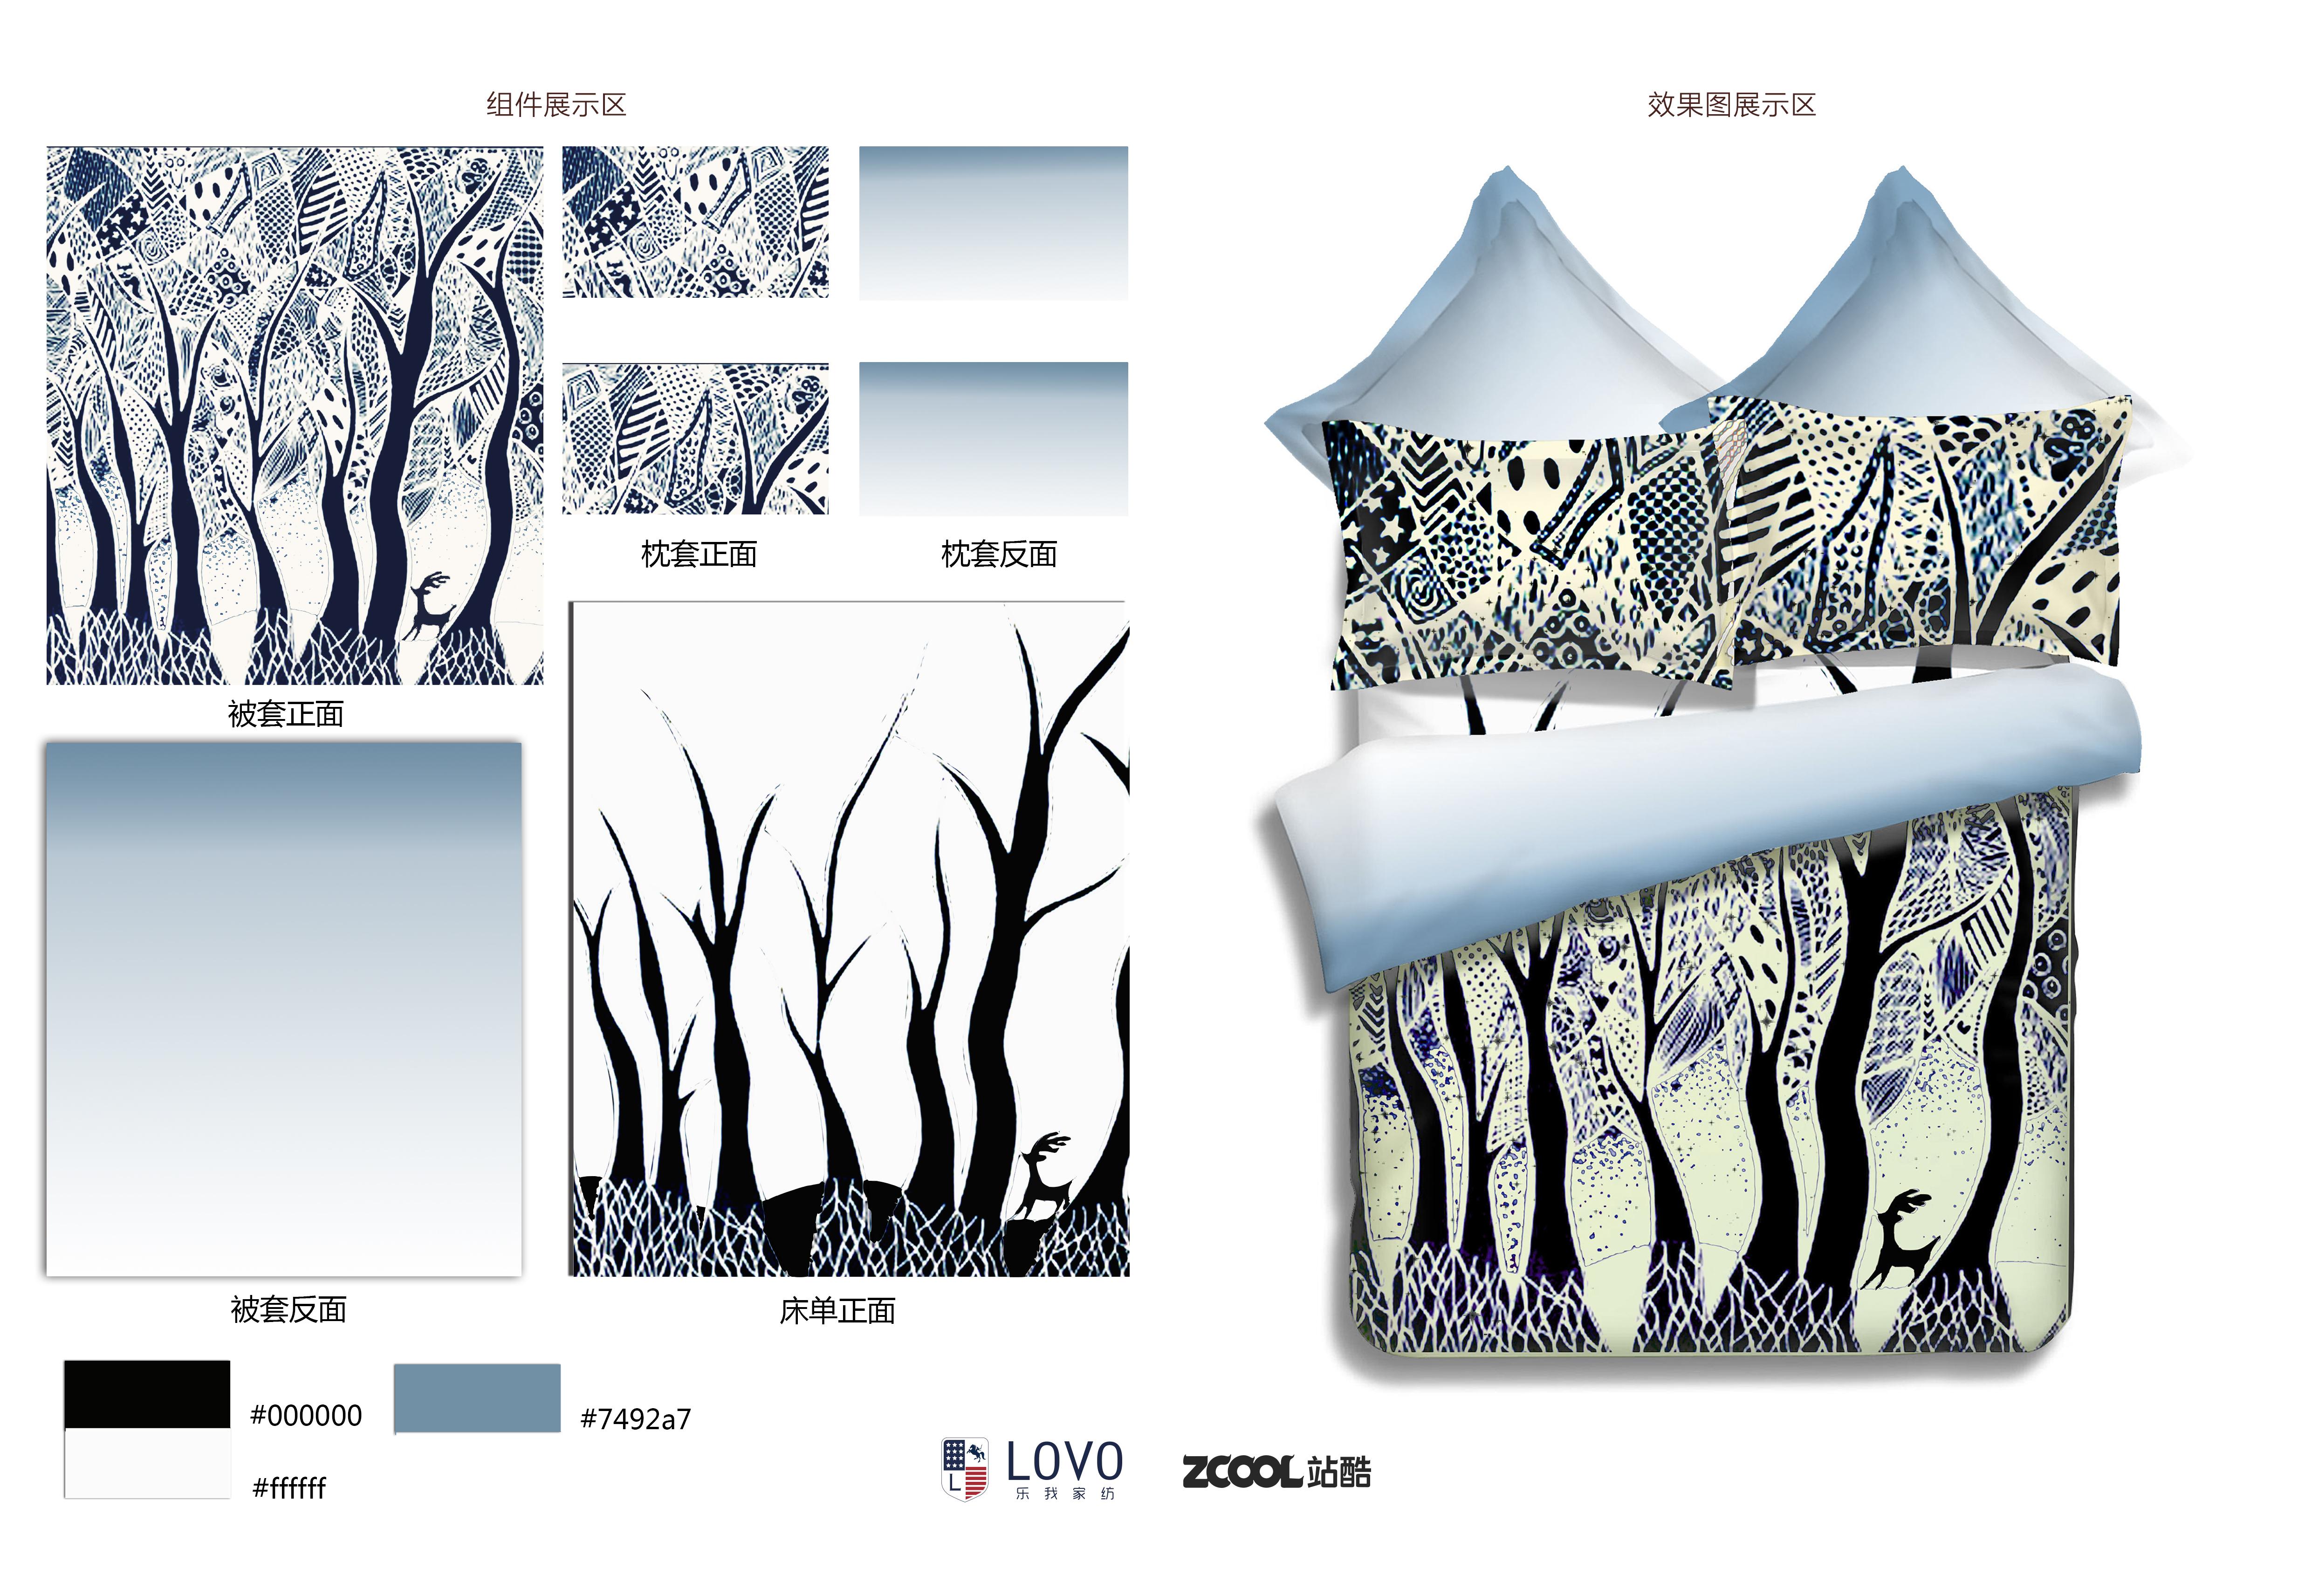 小森林(原创手绘)